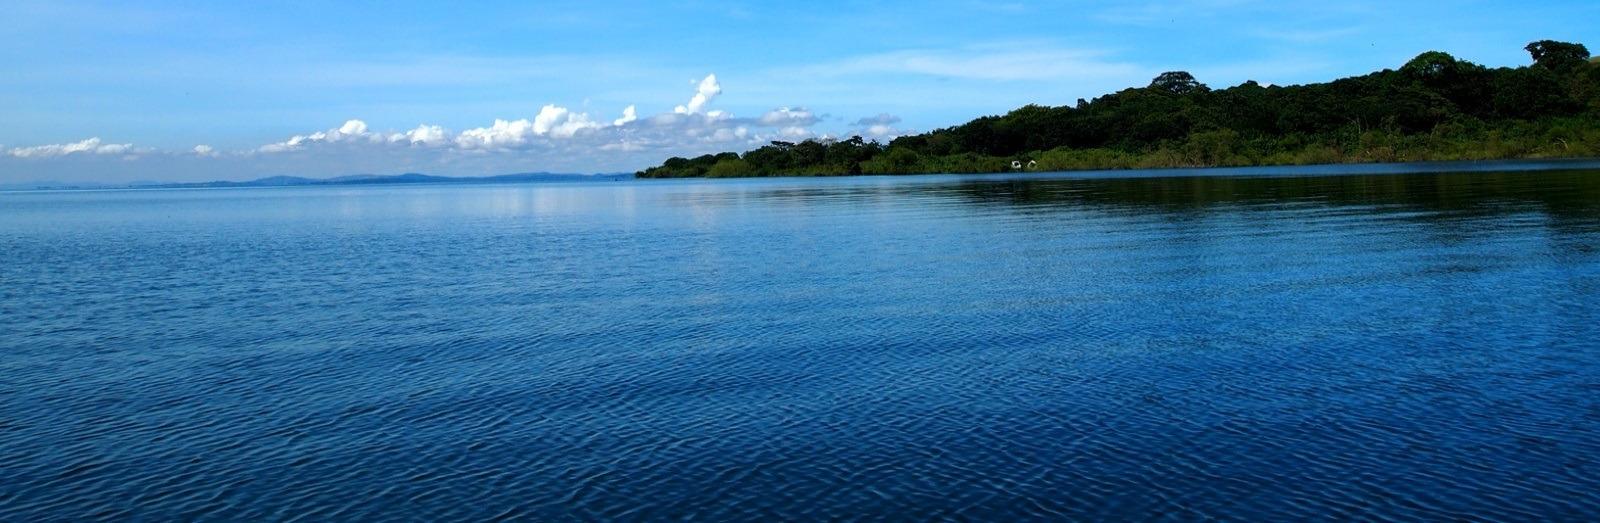 Adventure experience on Lake Victoria-Uganda Safaris News